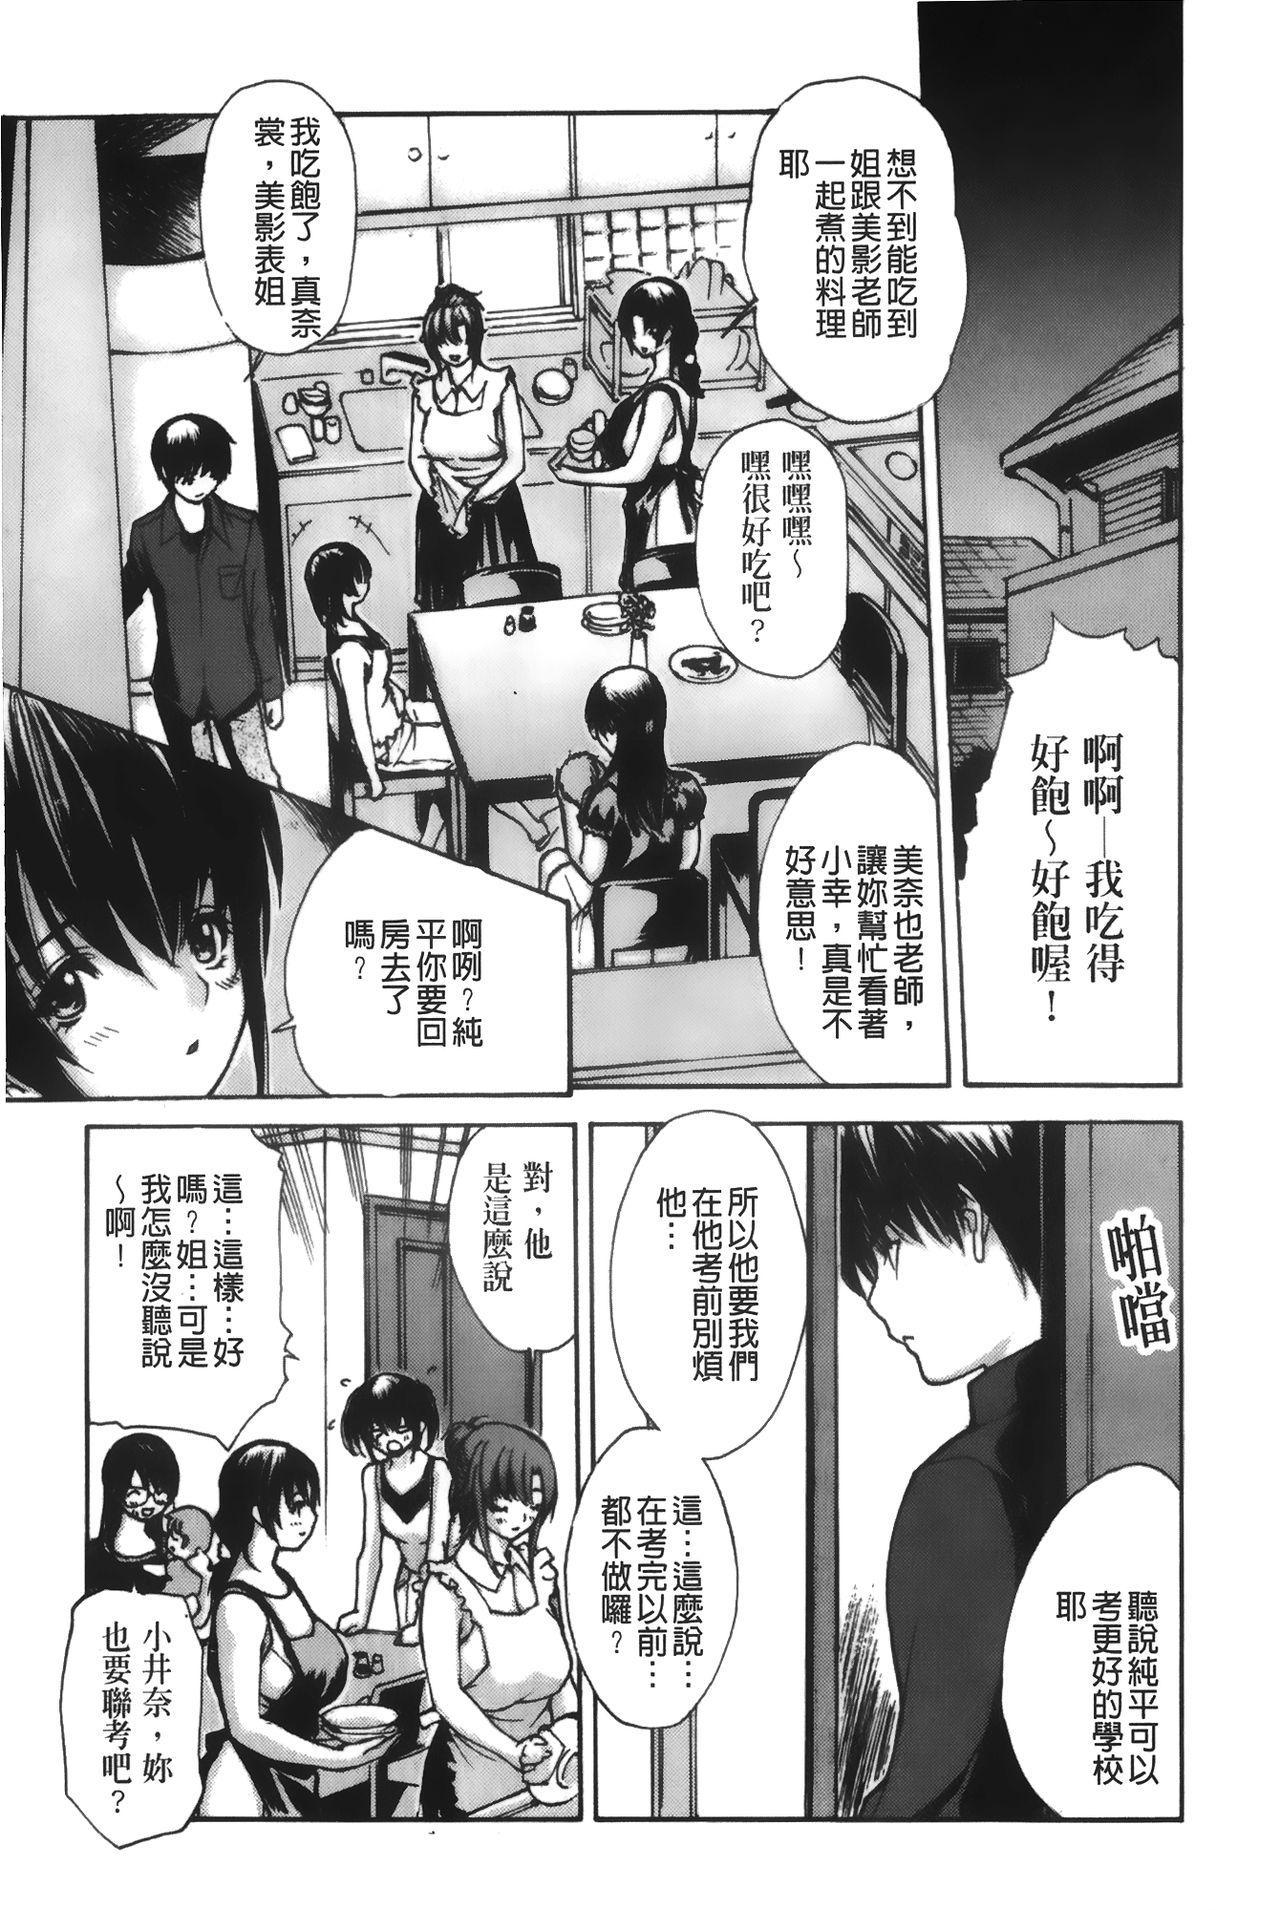 Tonari no Minano Sensei 4 | 隔壁的美奈乃老師 4 188